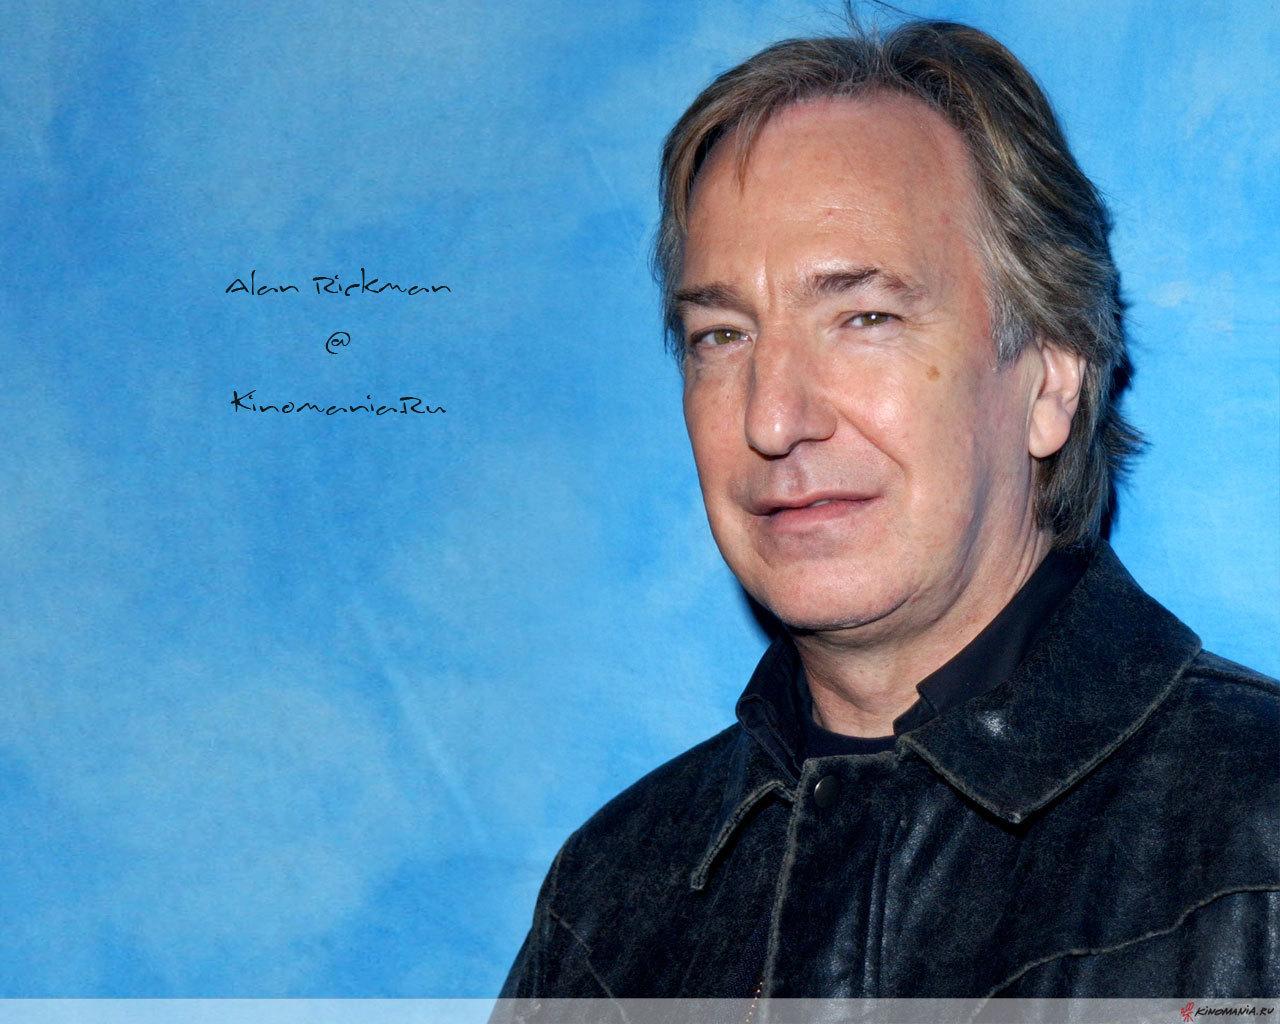 Alan Rickman - Alan Rickman Wallpaper (12842211) - Fanpop